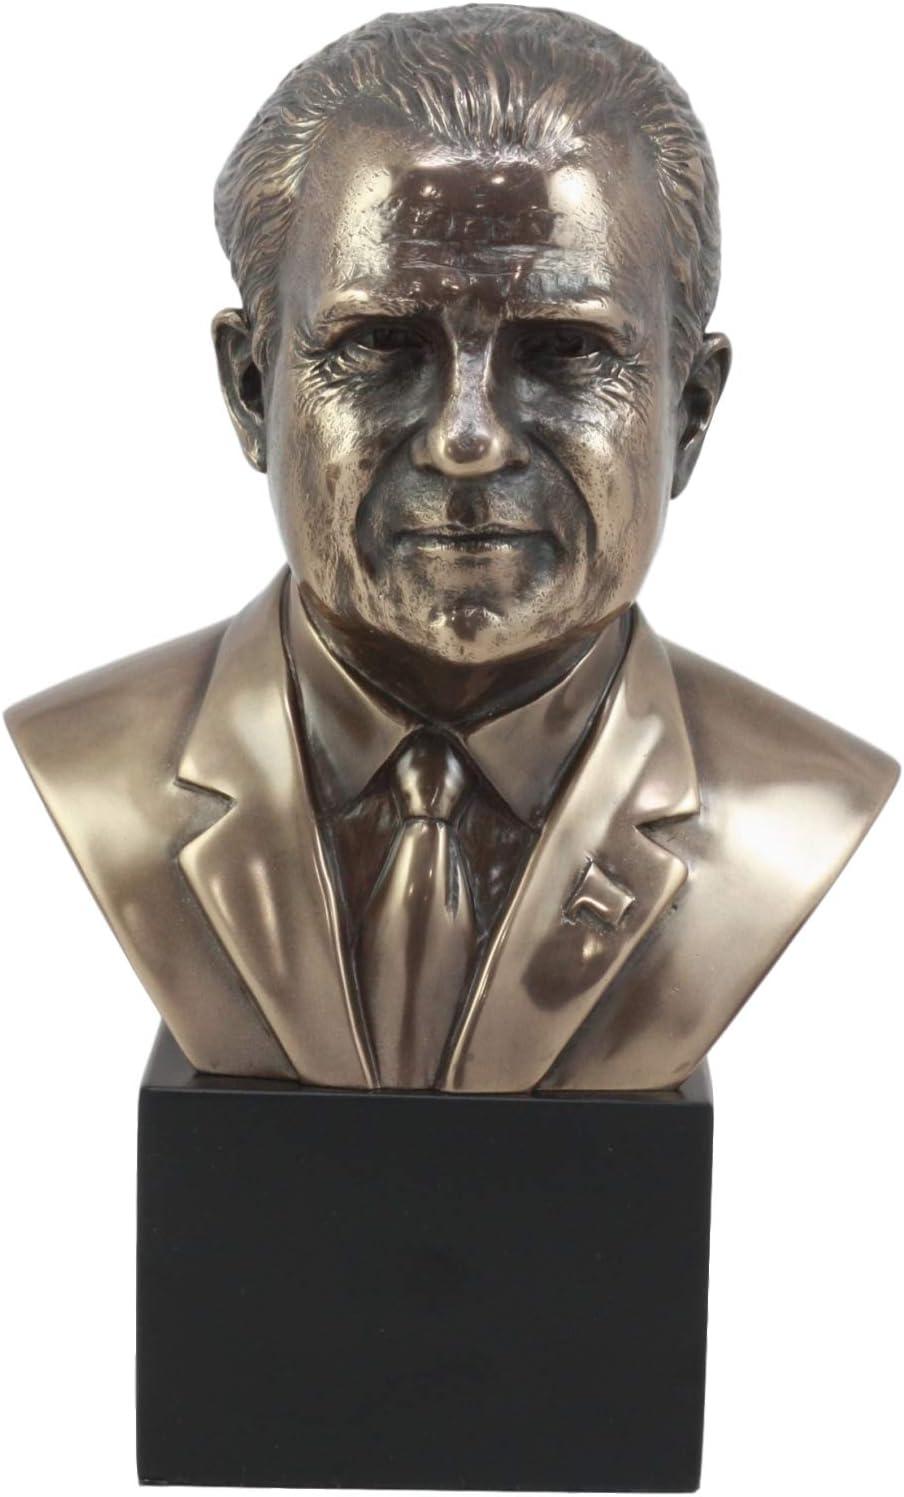 "Ebros United States President Richard Nixon Bust Figurine 9"" H Political Memorabilia Statue"